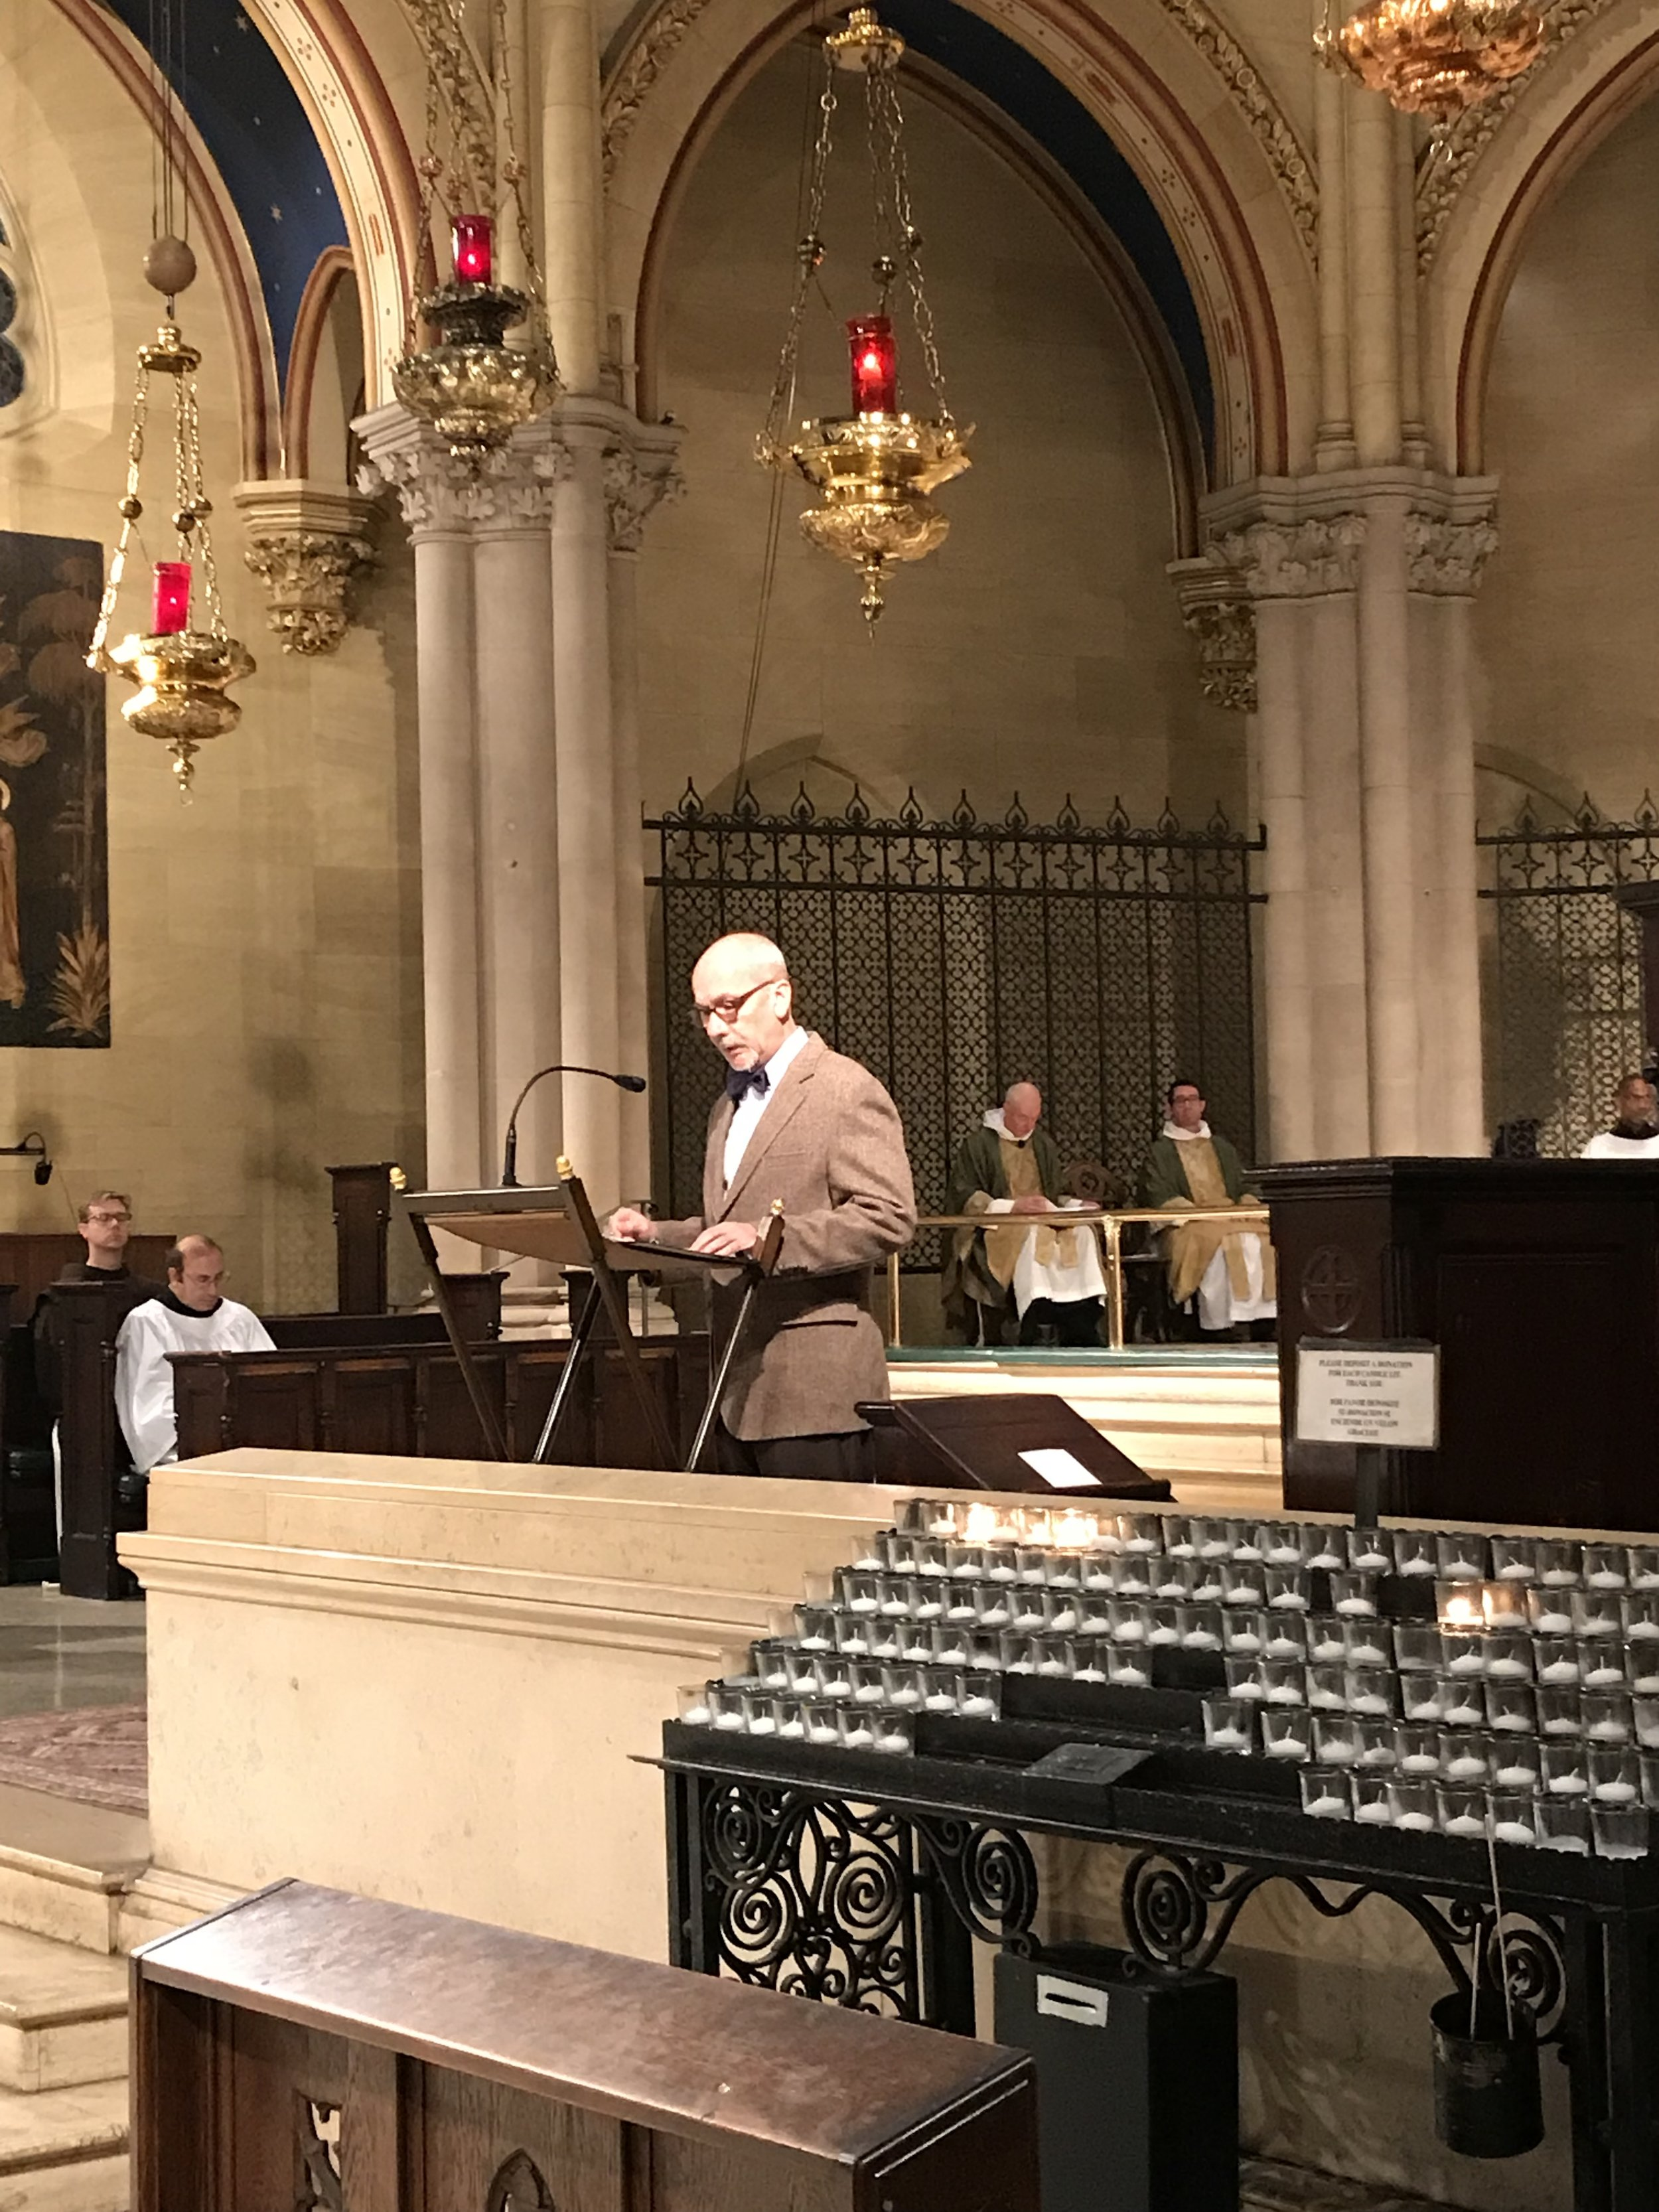 Steve Potanovic was reader for the Solemn Mass.   Photo by Br. Damien SSF